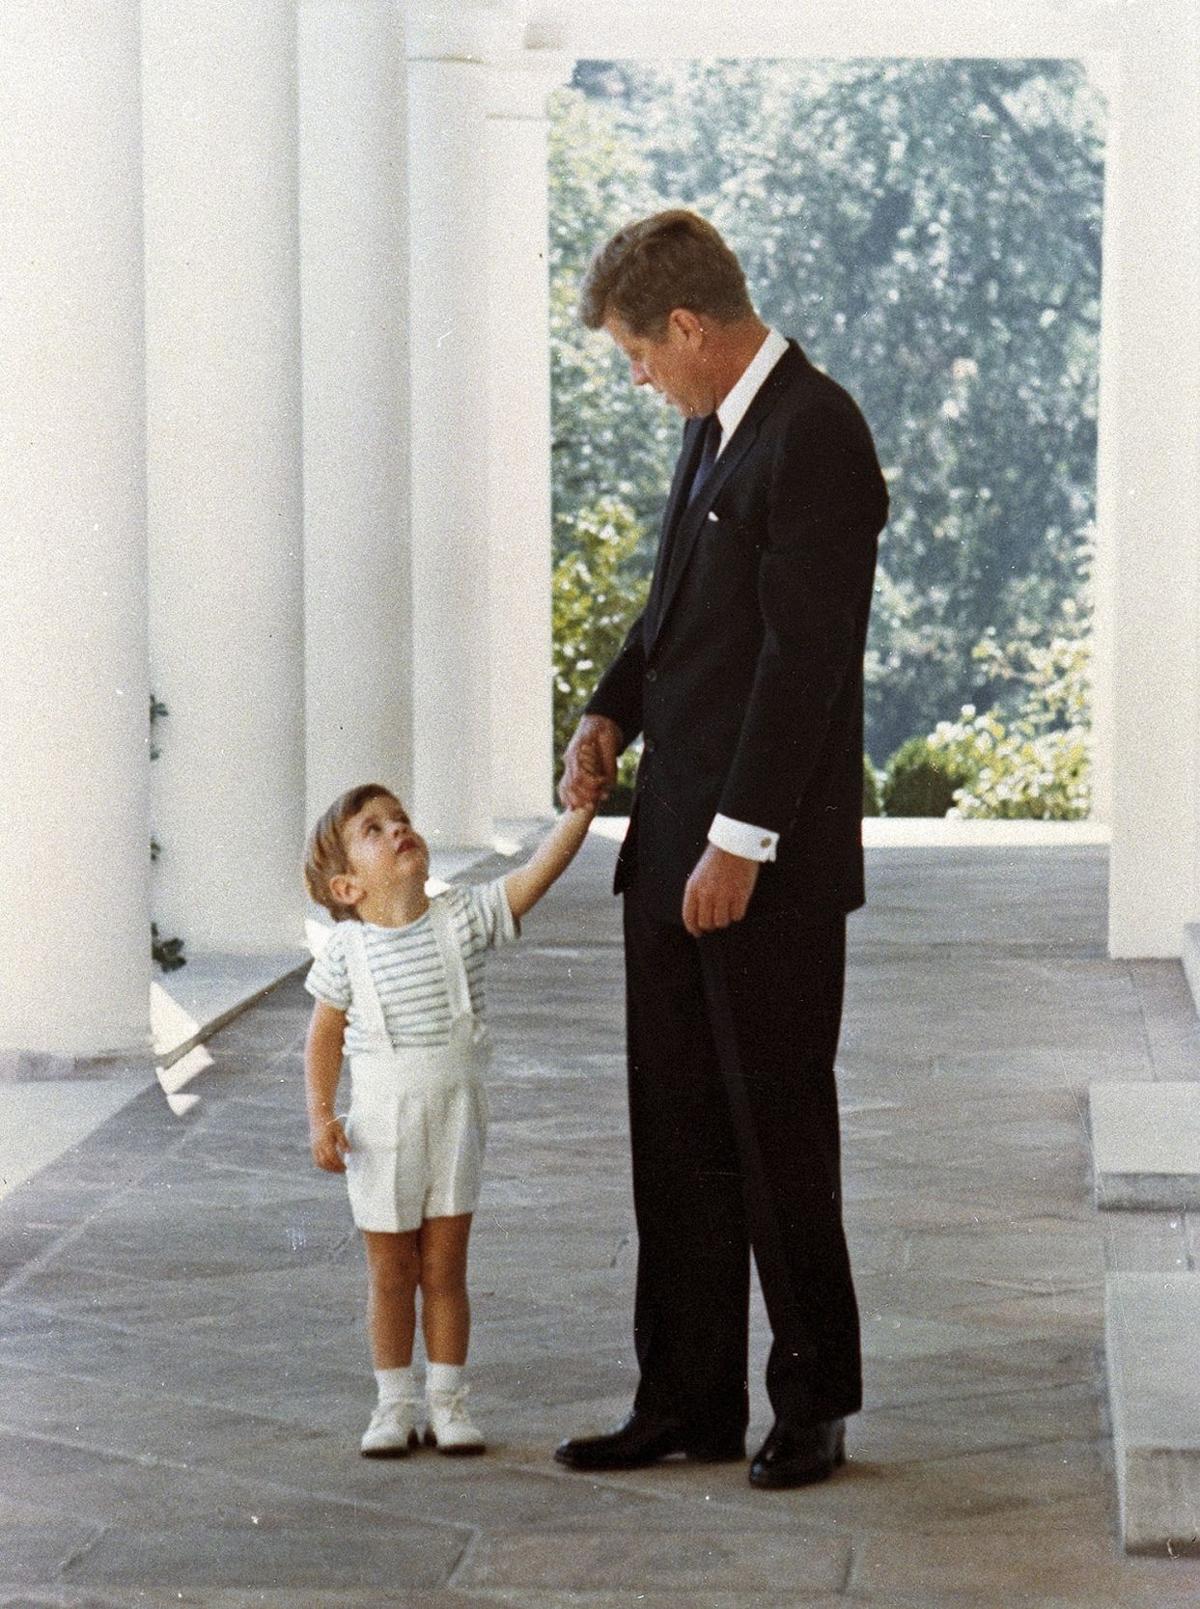 New JFK Jr. documentary looks back at 'America's prince'